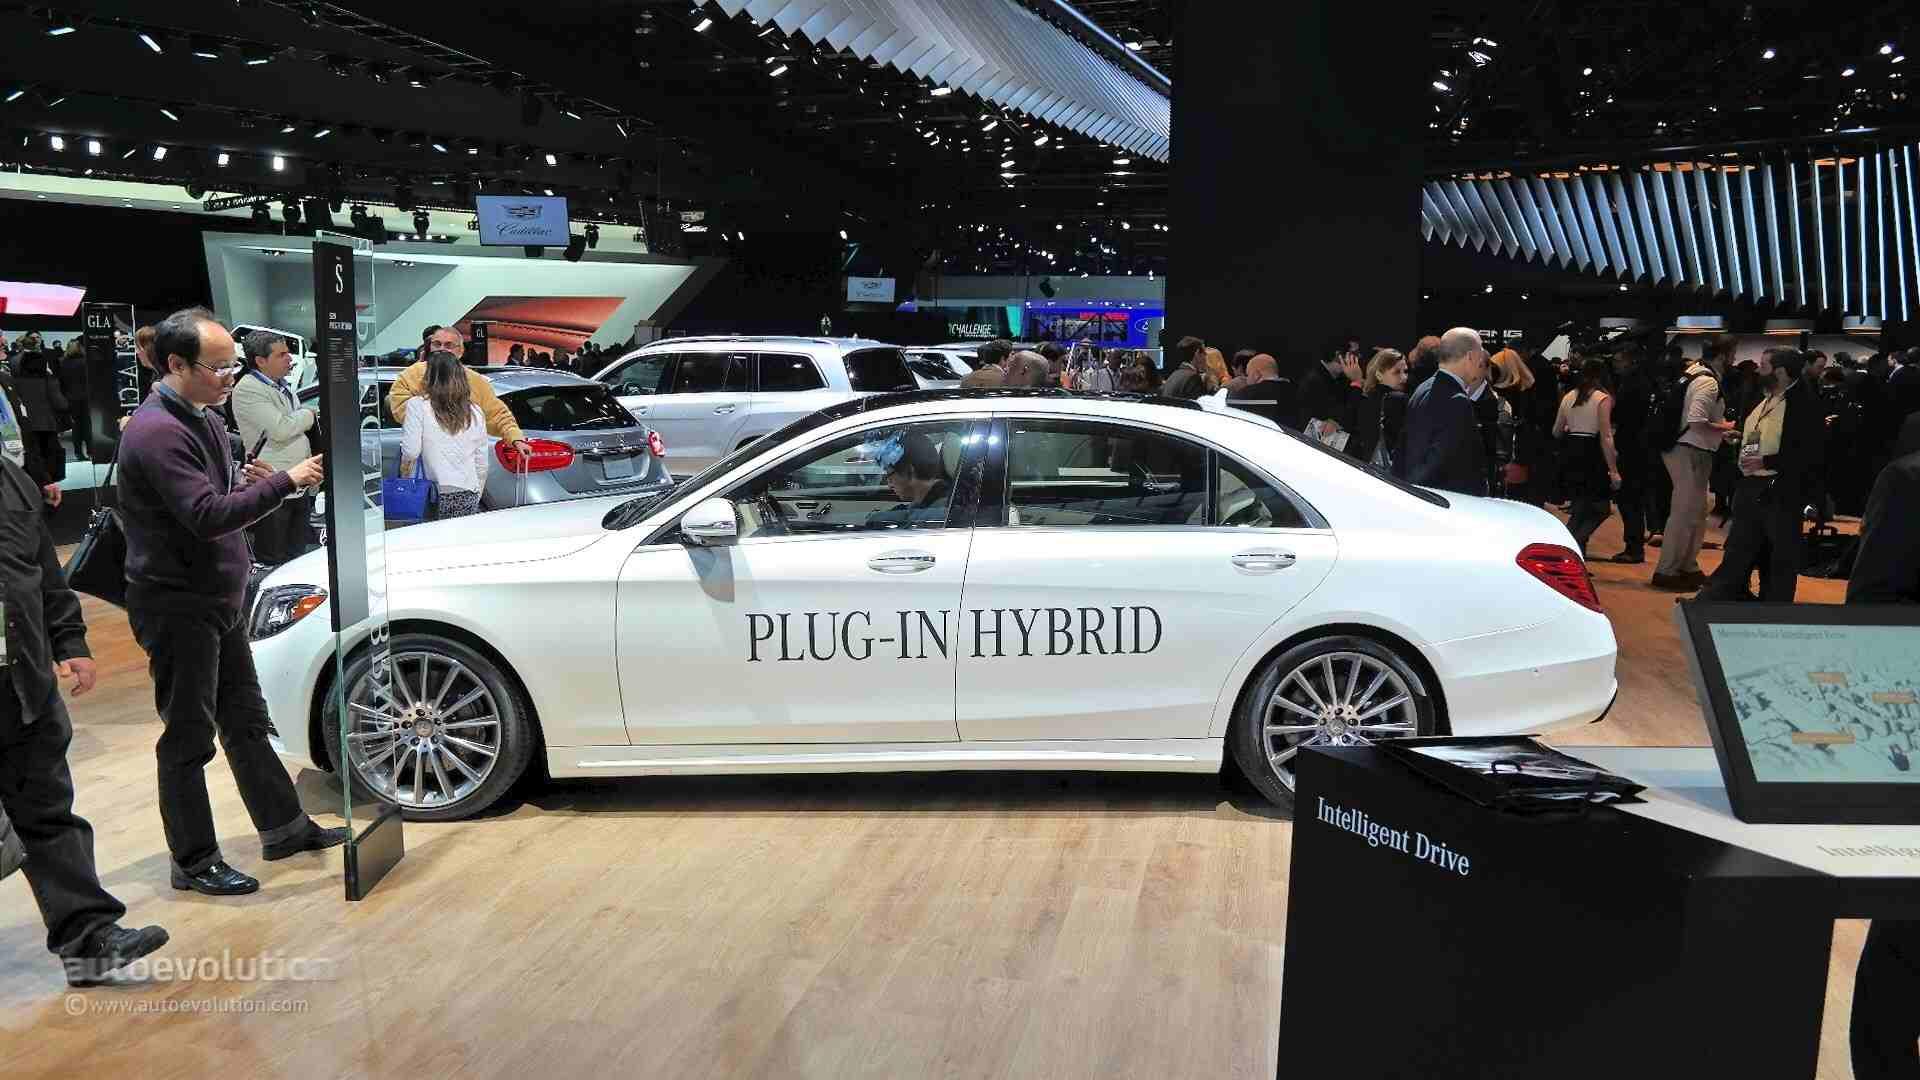 2017 S550e Plug-In HYBRID Sedan | Mercedes-Benz